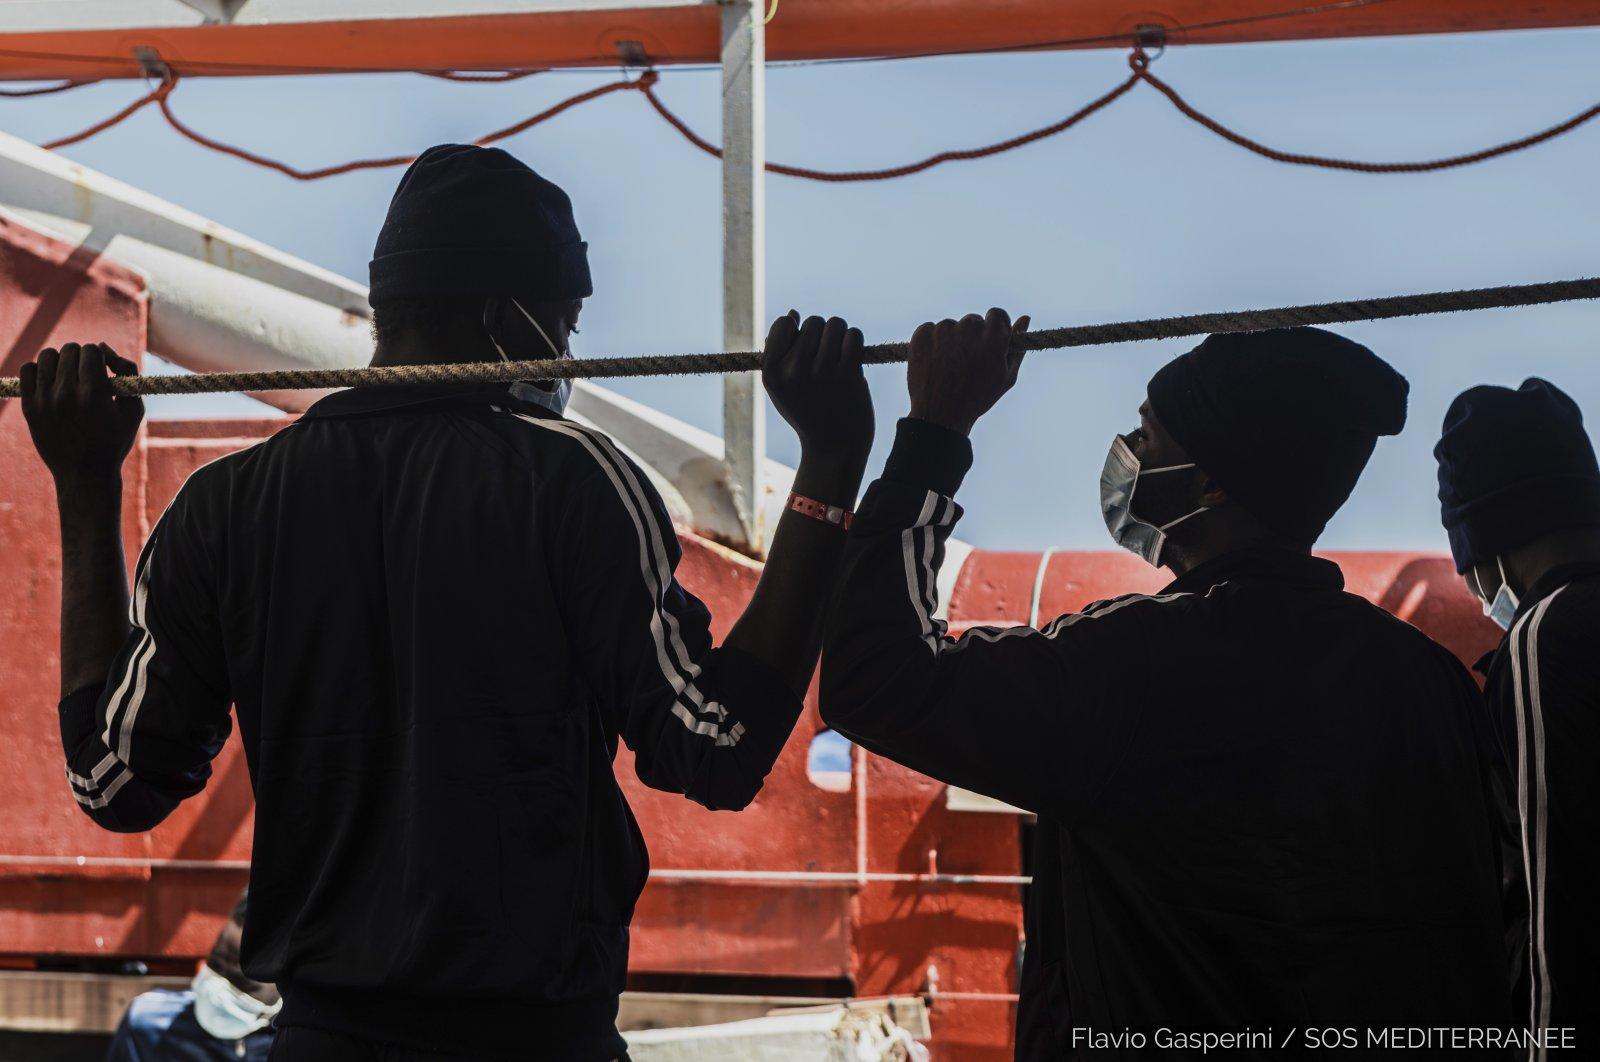 Migrants look at the sea from aboard the Ocean Viking during its navigation in the Mediterranean Sea, April 29, 2021. (SOS Mediterranee via AP)